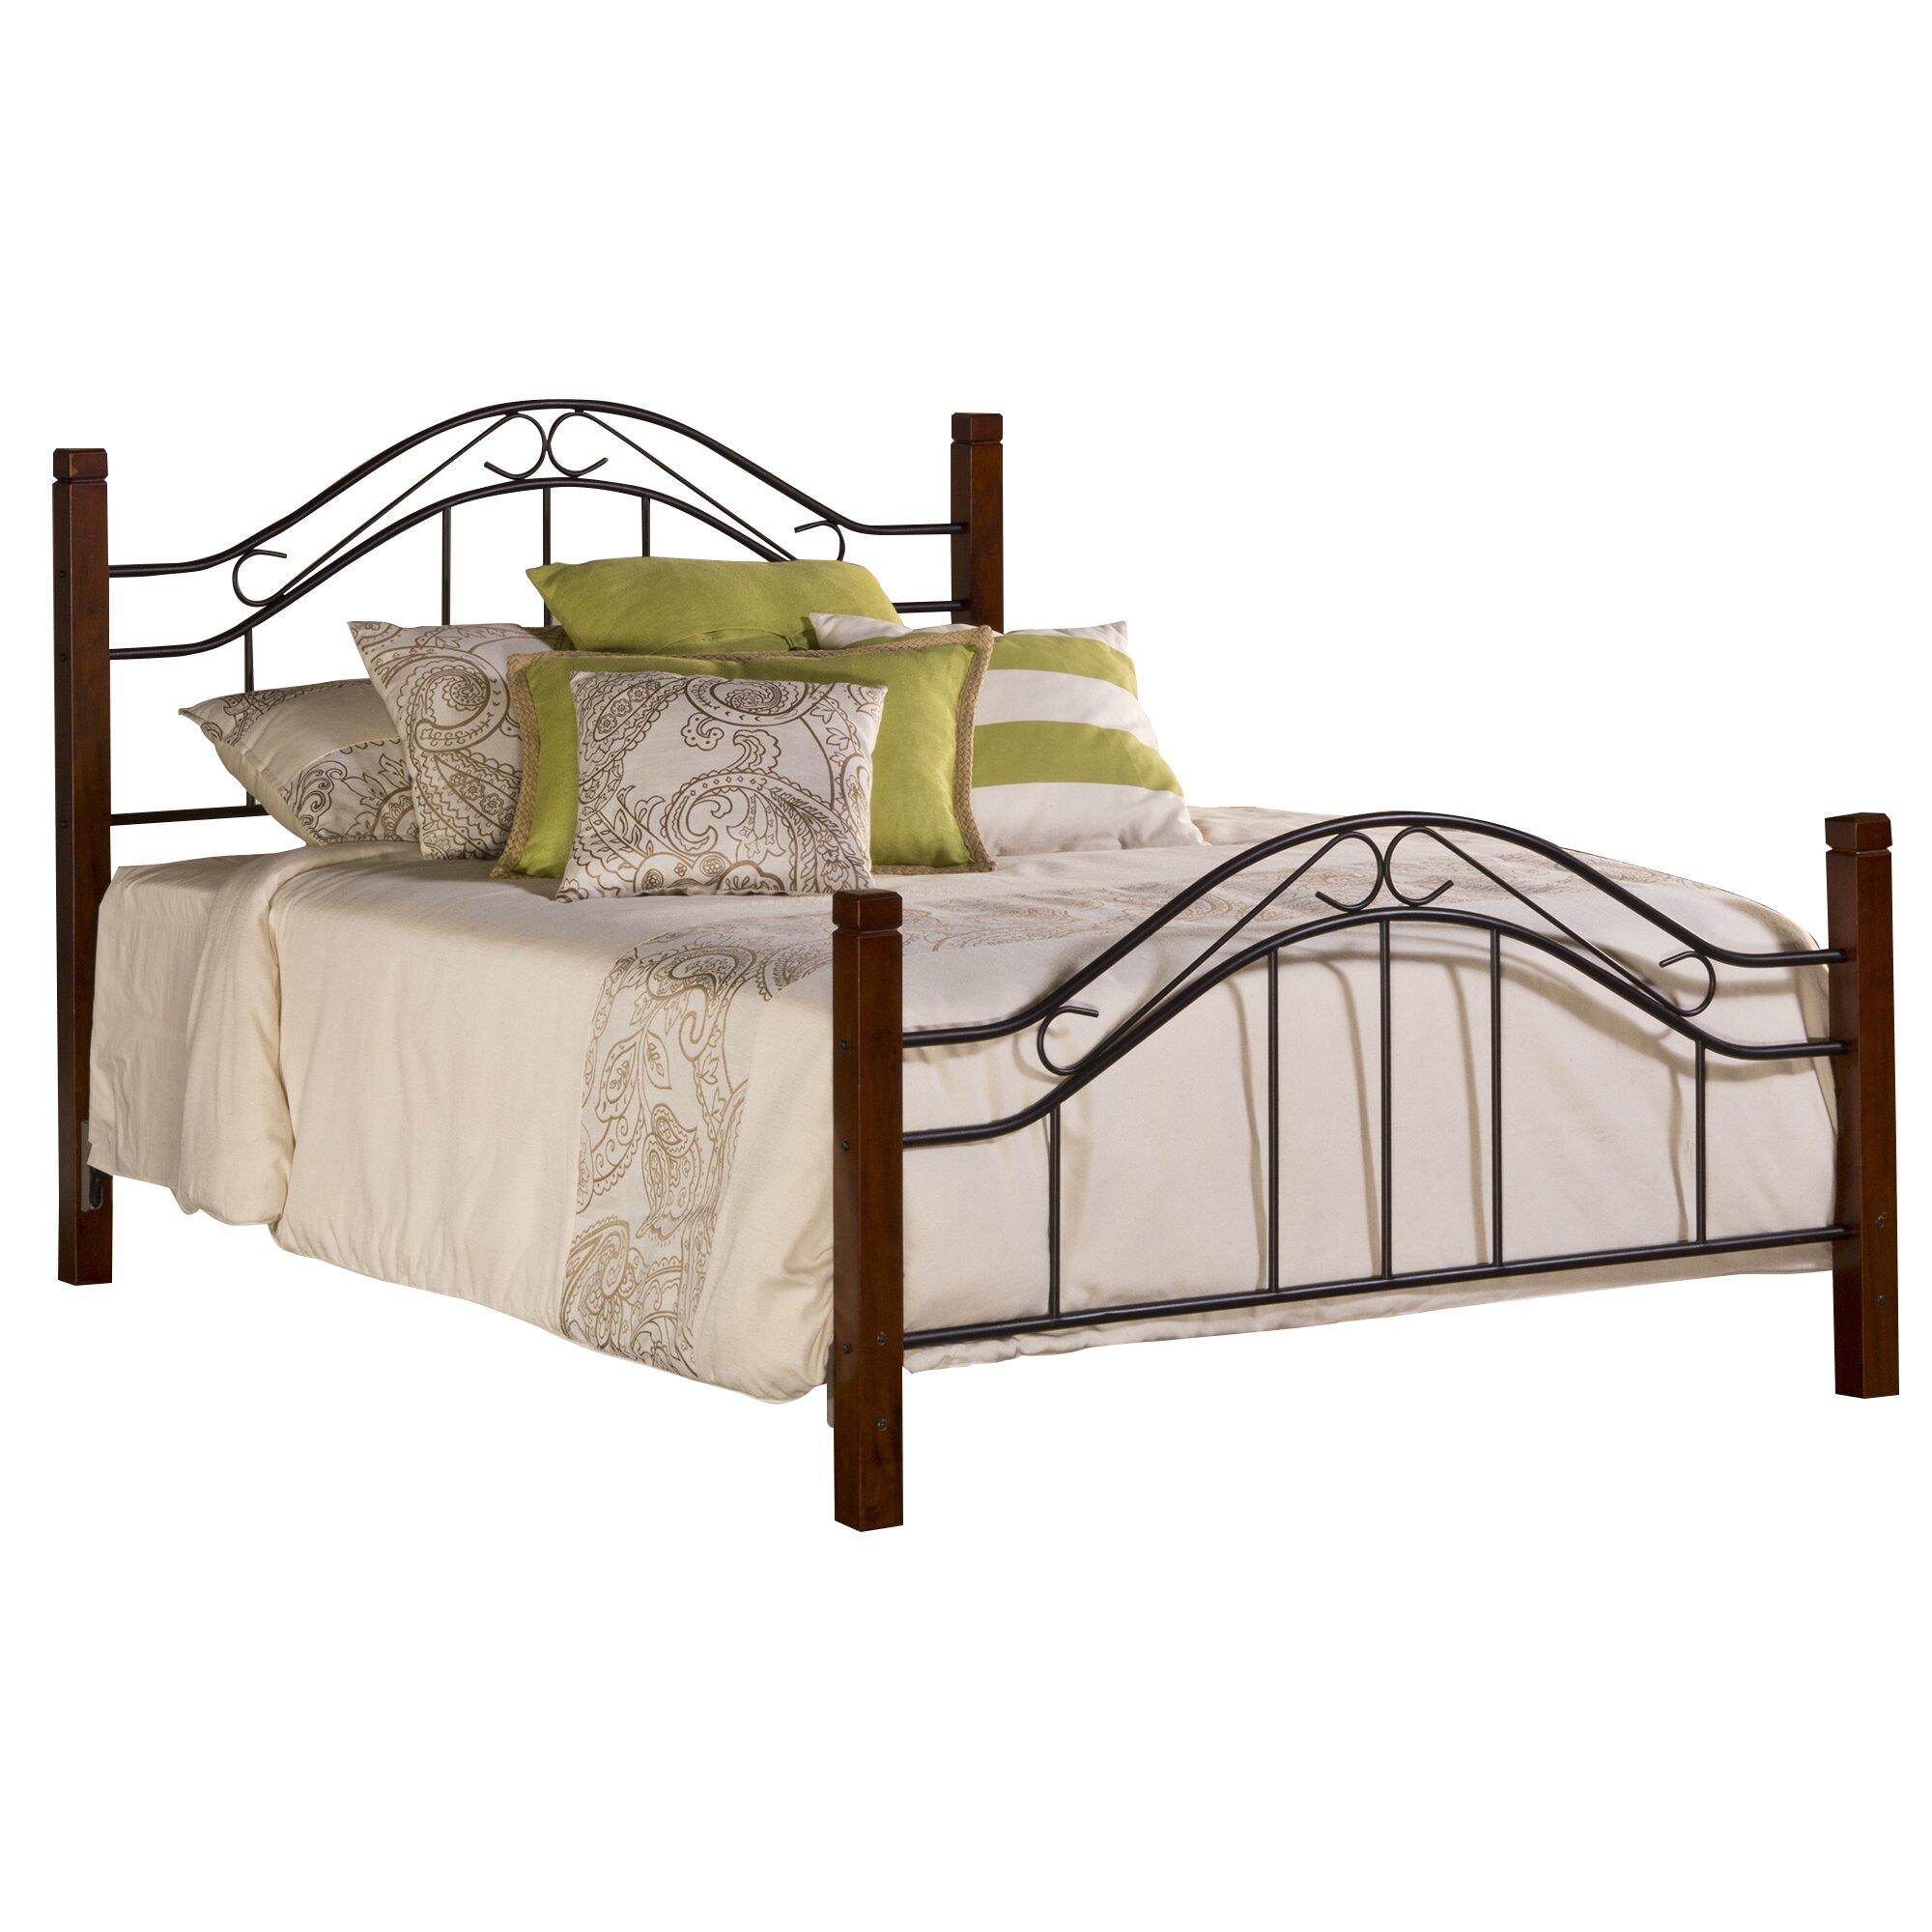 Hillsdale Matson King Size Metal Bed